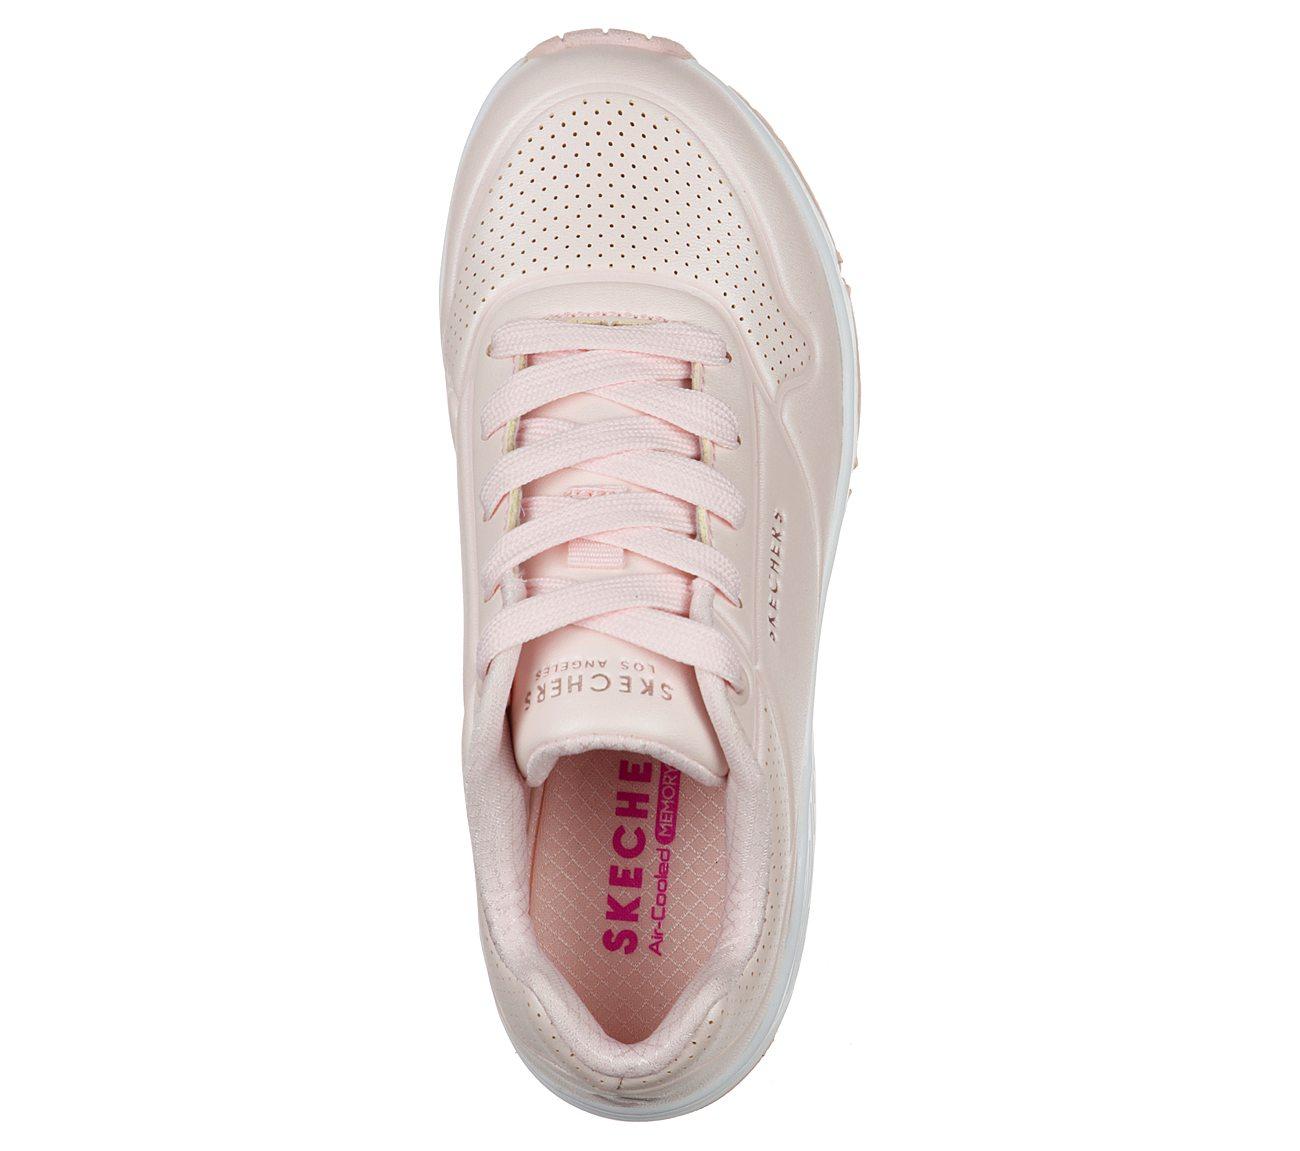 SKECHERS Uno - Pearl SKECHER Street Shoes